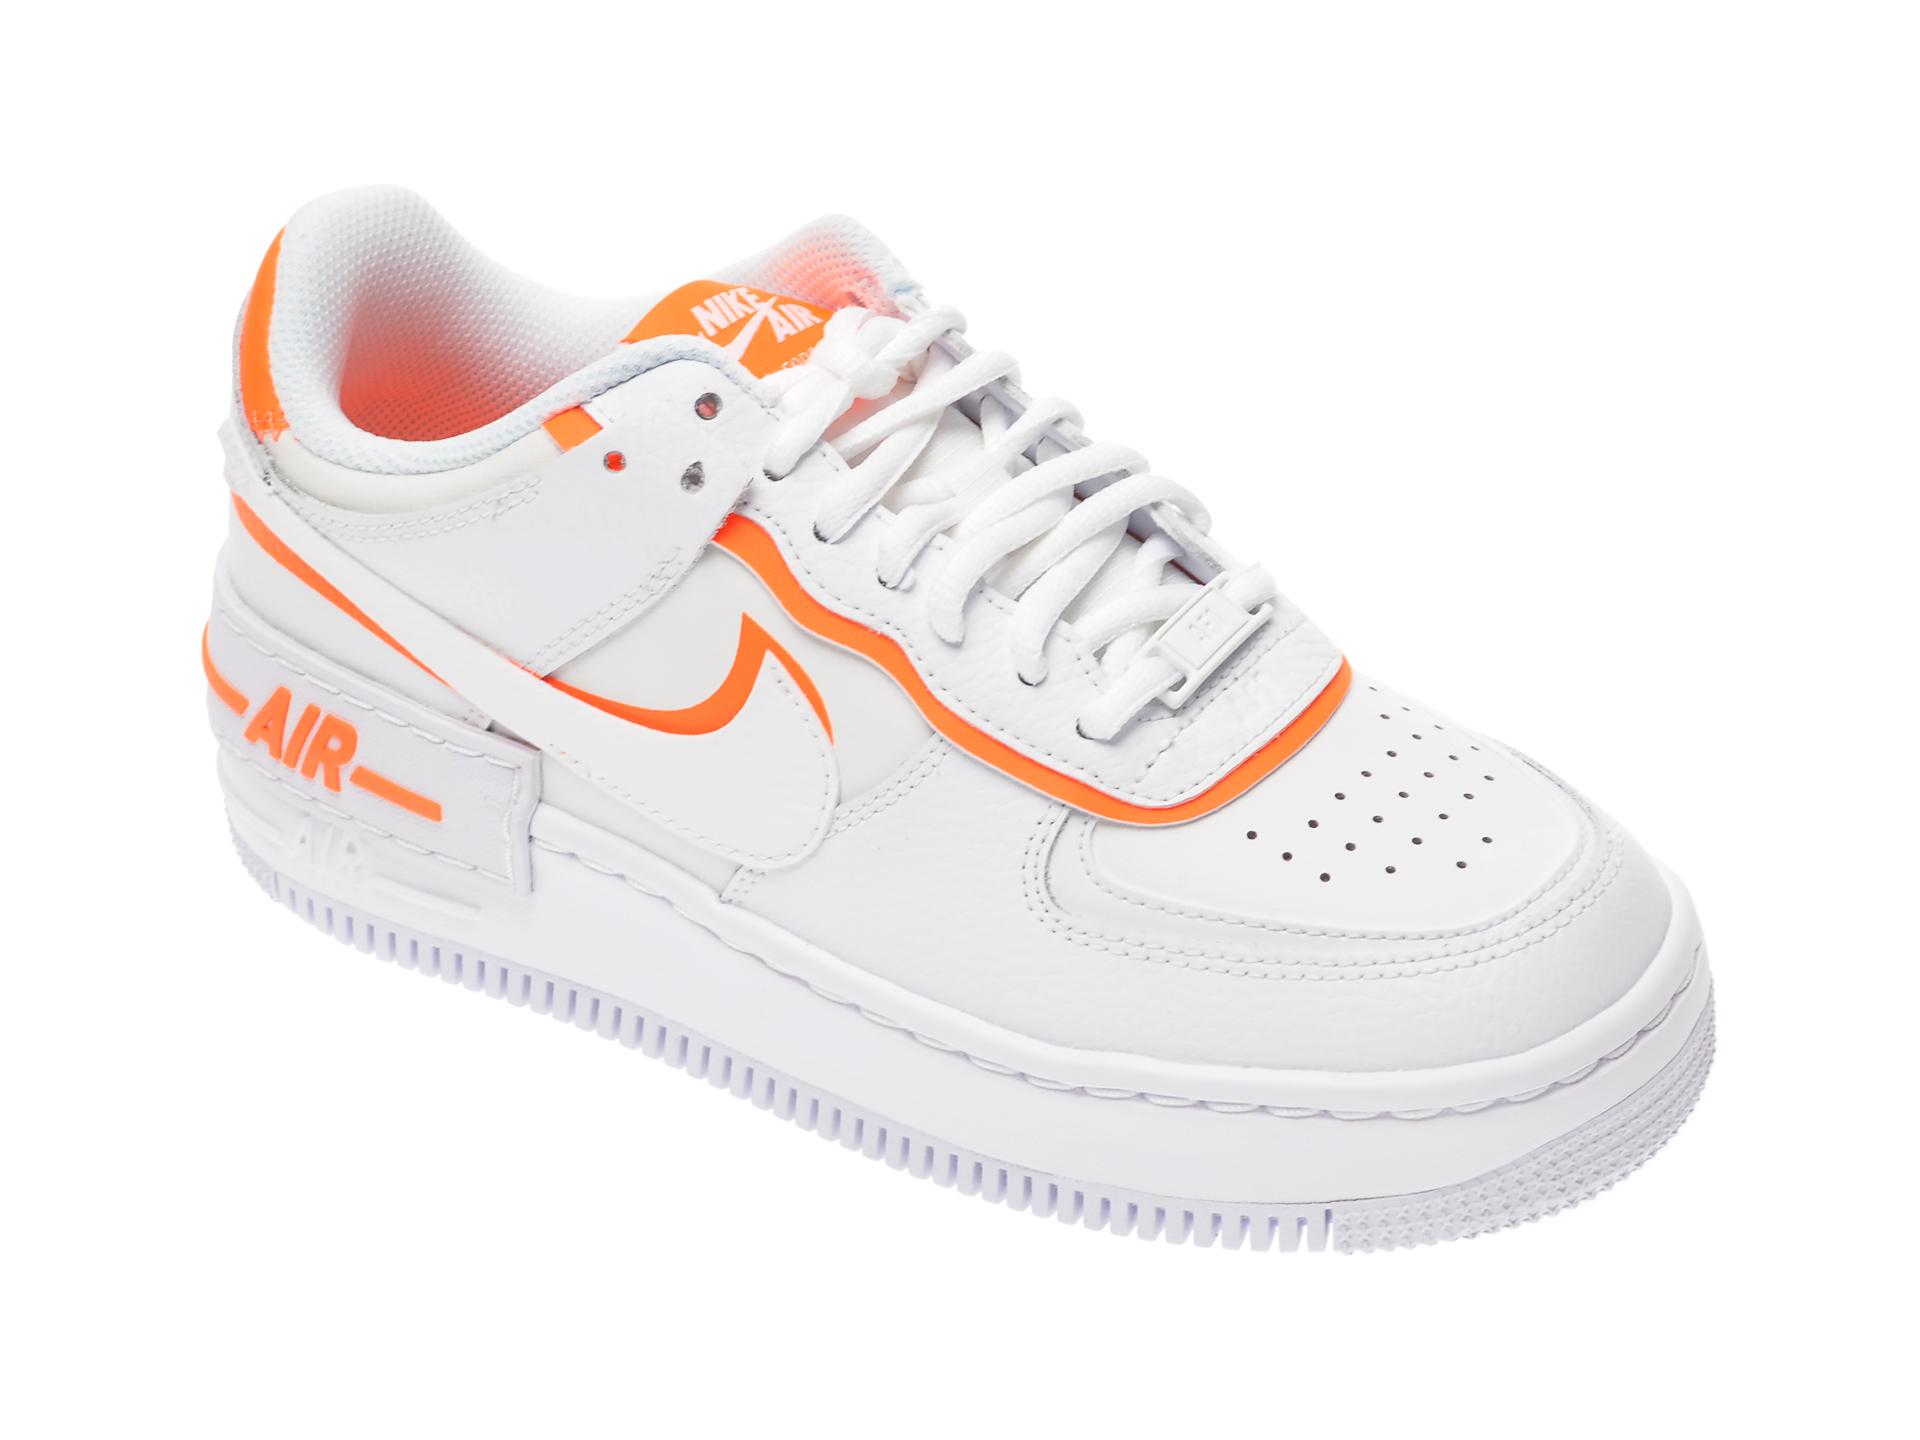 Pantofi sport NIKE albi, Af1 Shadow, din piele naturala si piele ecologica